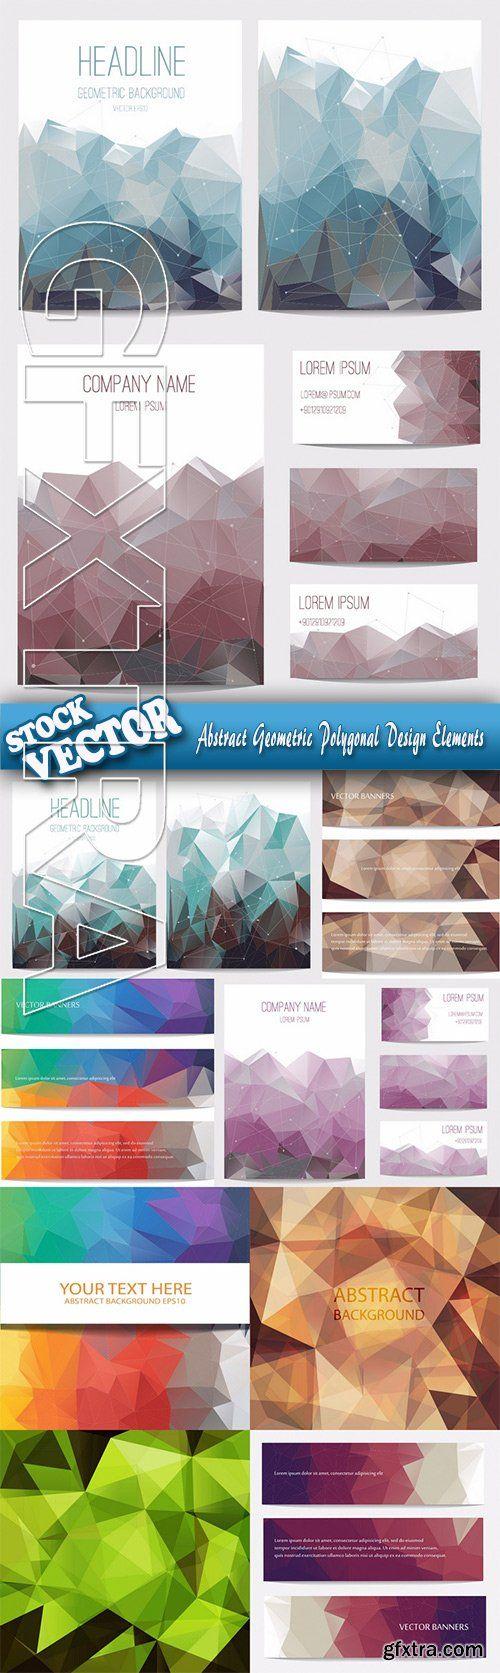 Stock Vector - Abstract Geometric Polygonal Design Elements